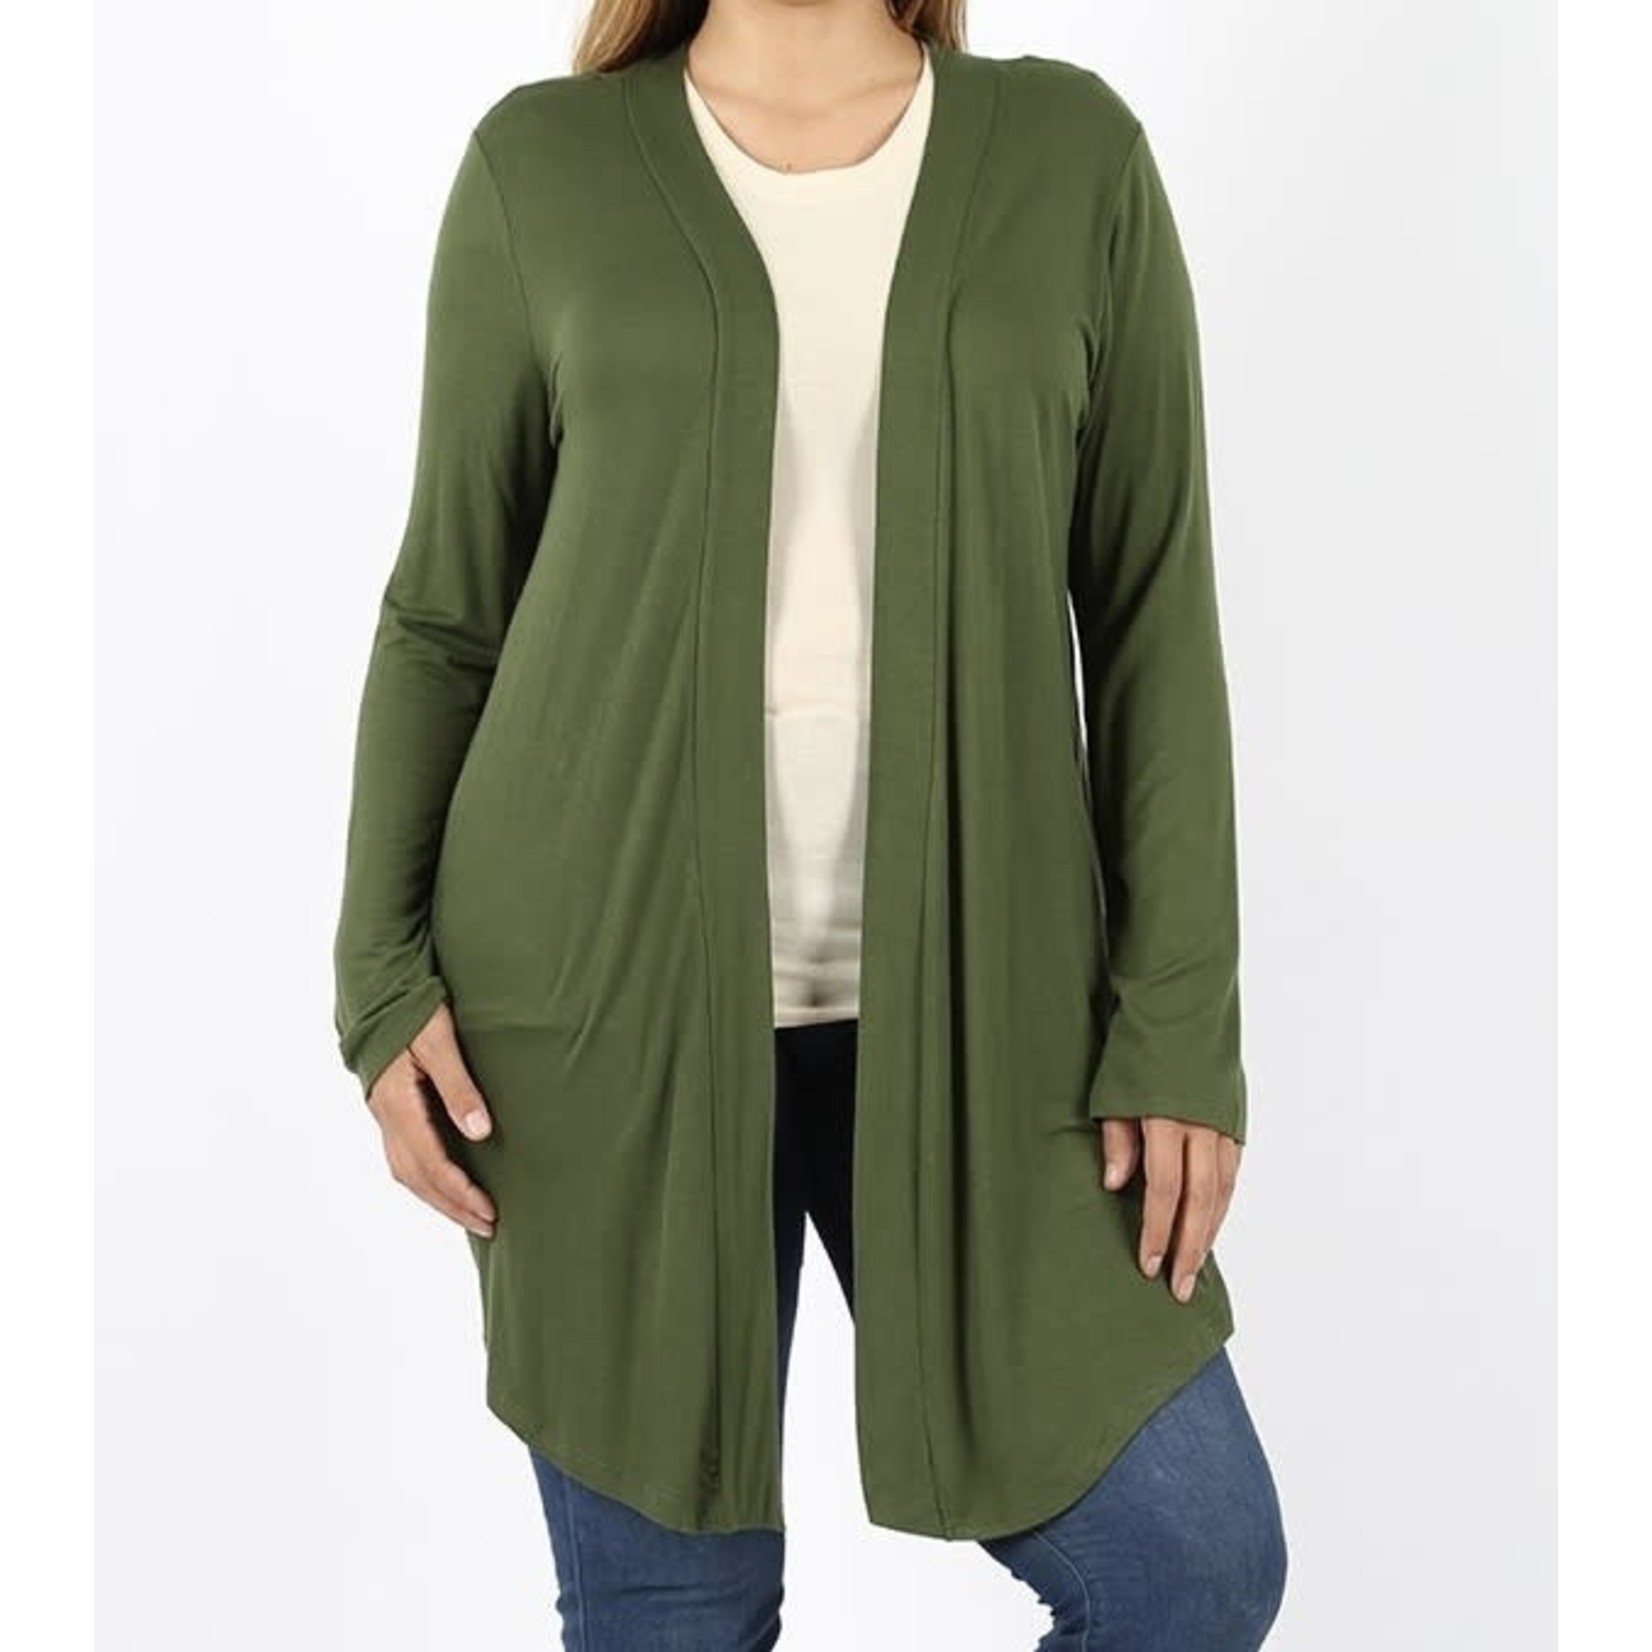 Zenana Plus Size Drapery Open Front Cardigan